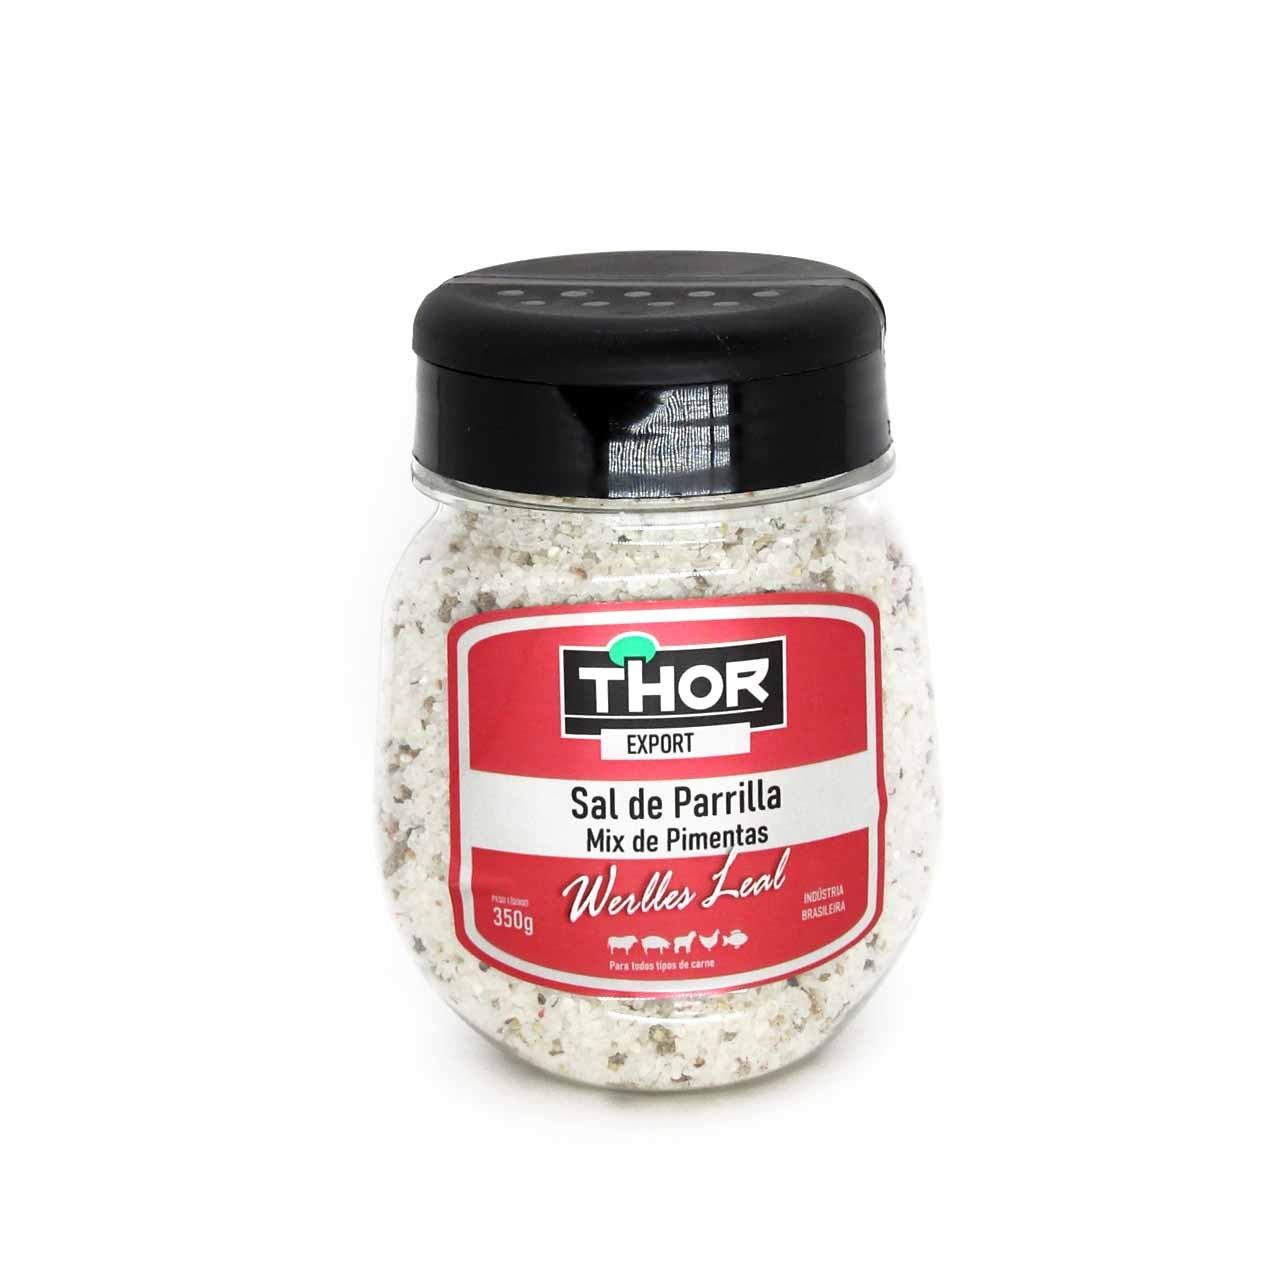 Sal de Parrilla Werlles Leal Mix de Pimentas Thor 350gr